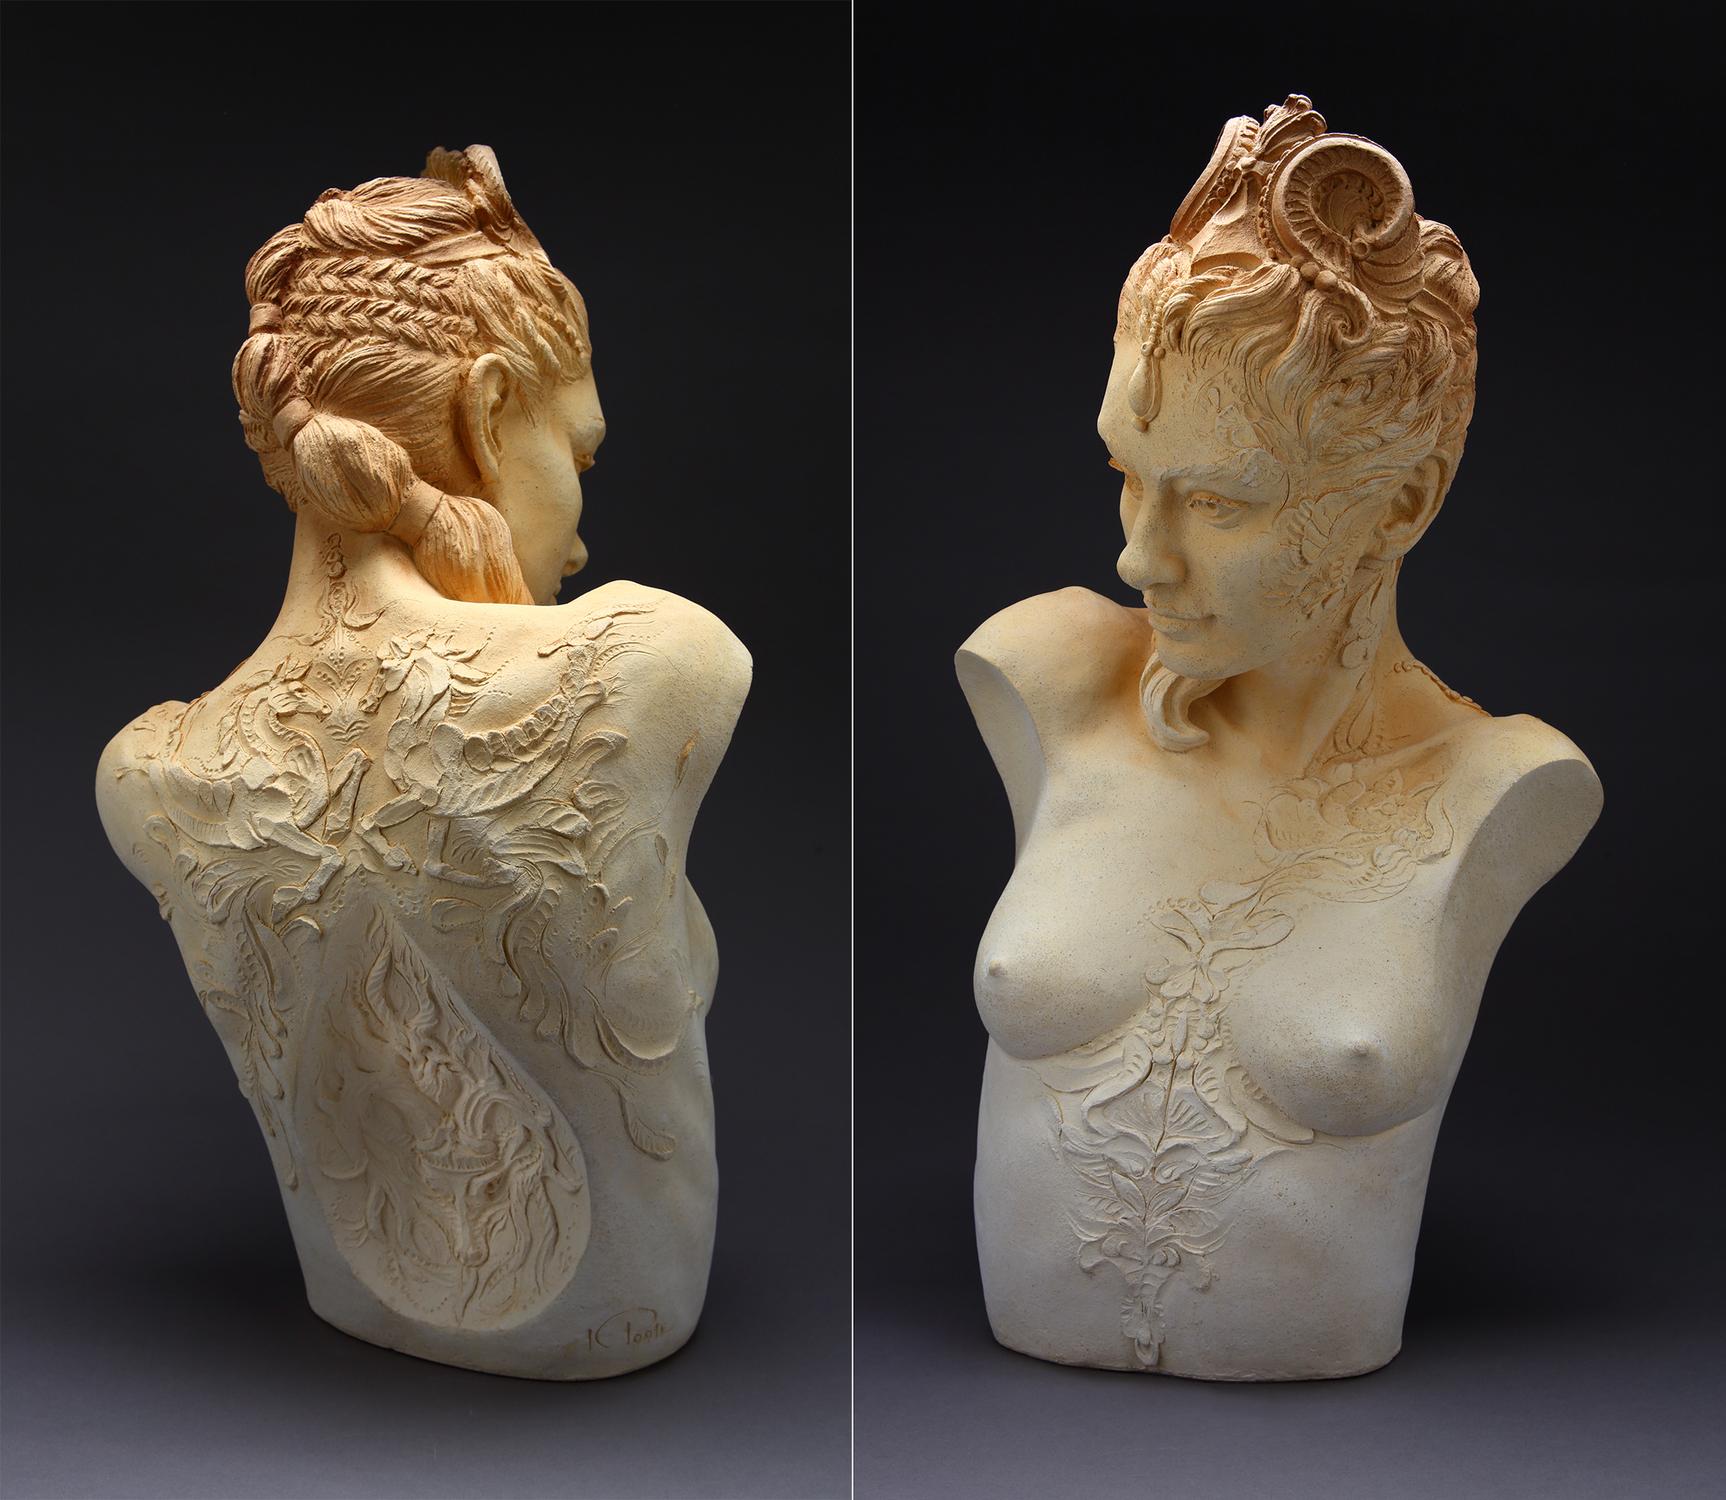 Koketa, Flirtation of the Muse Artwork by Colin  Poole